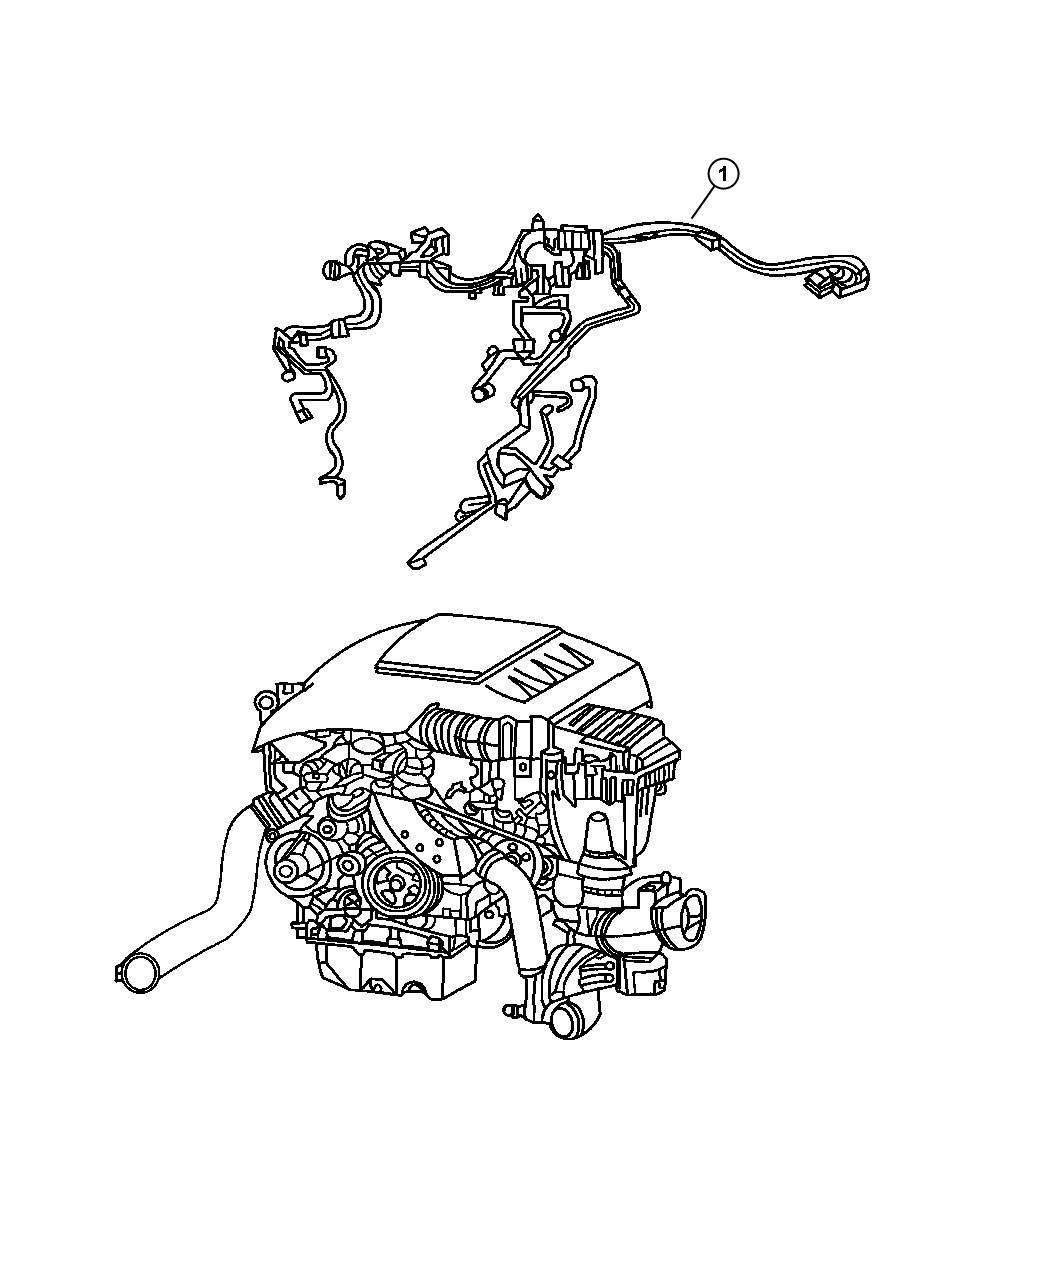 Jeep Grand Cherokee Wiring. Engine. After, diesel